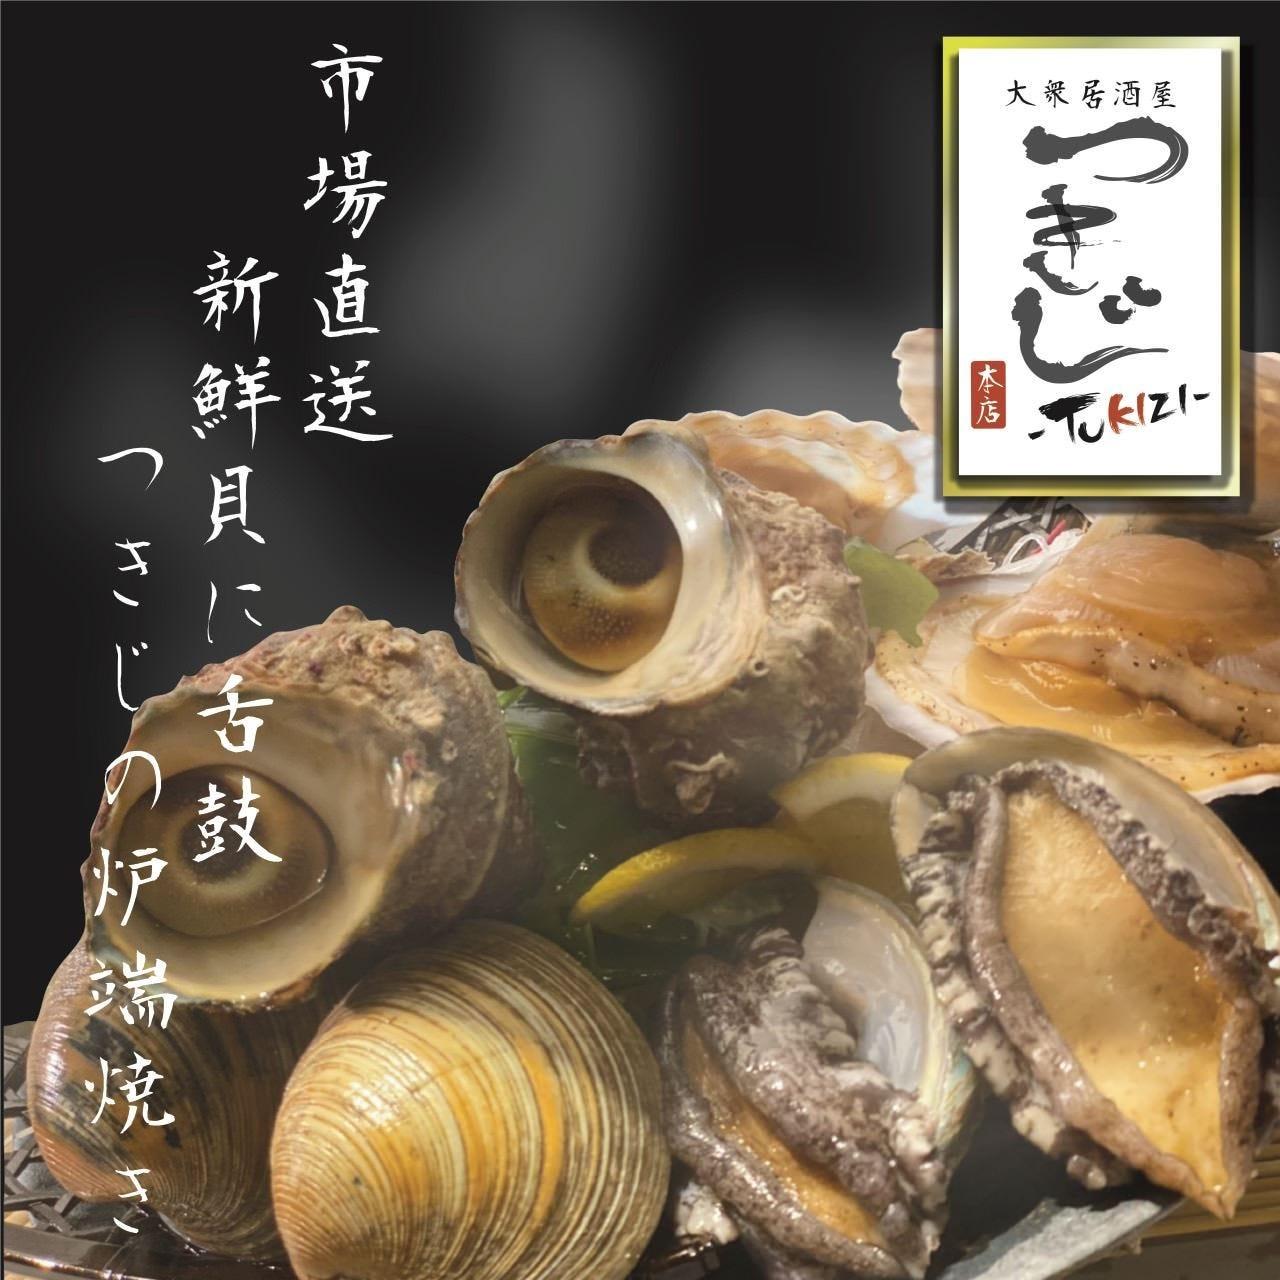 海鮮炉端焼き×個室 大衆居酒屋 つきじ〜TUKIZI〜豊田市駅前店